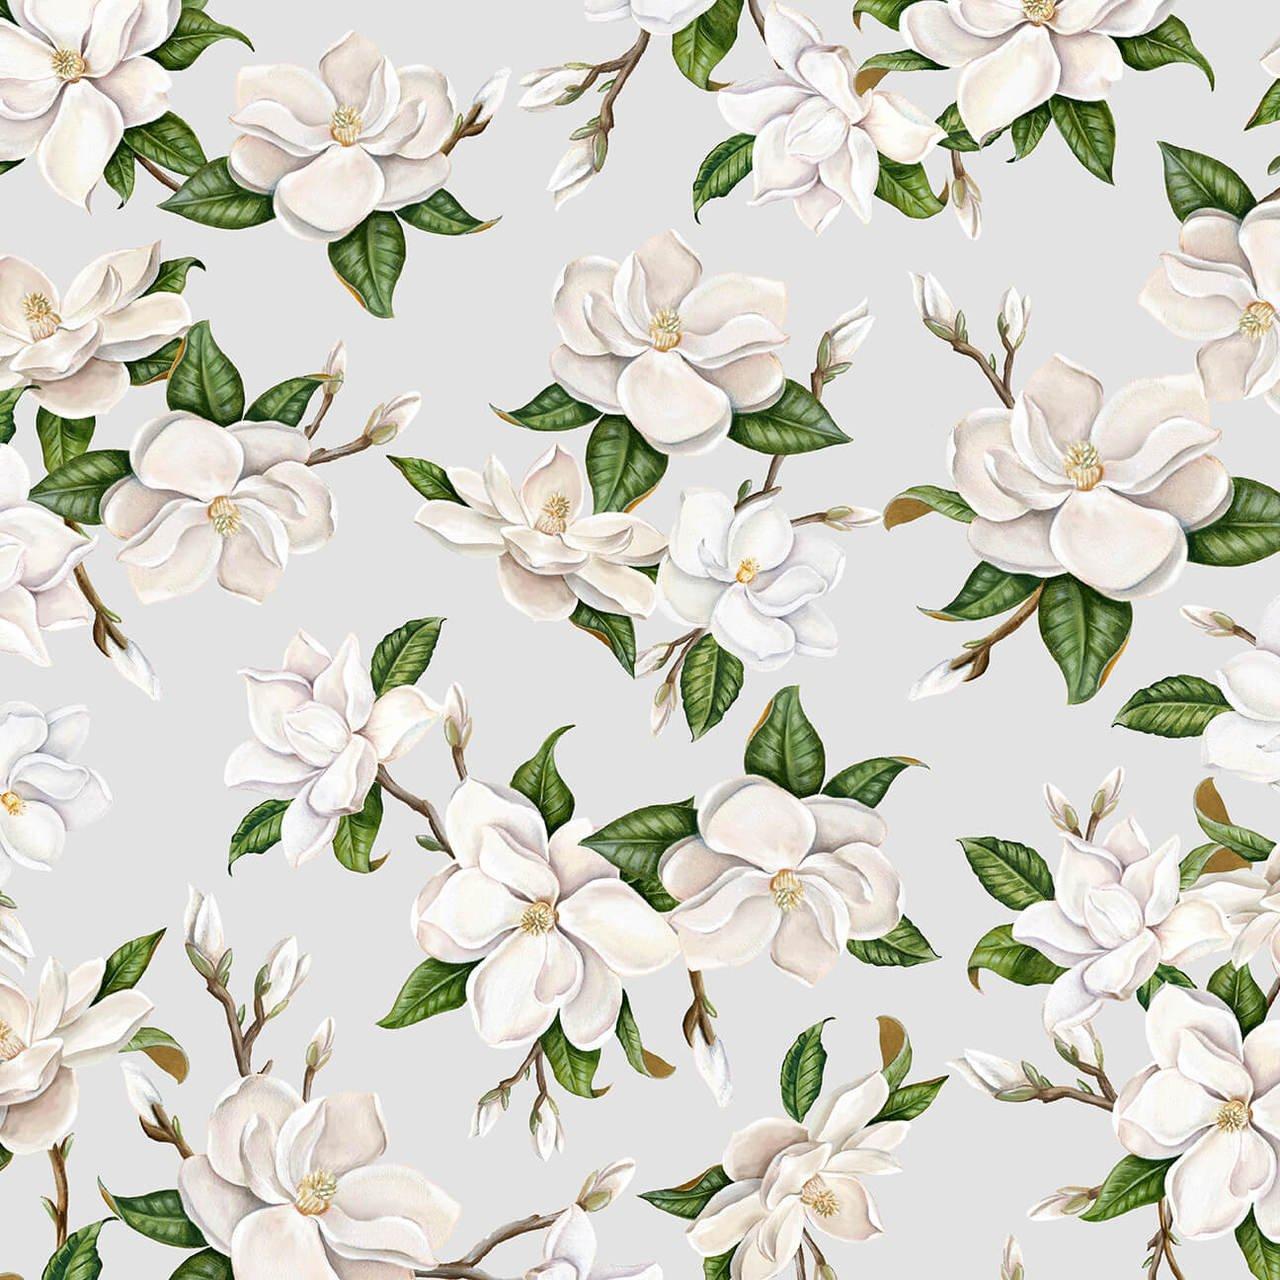 Magnolia Mania - Light Grey Large Flower - 9844-90 Lt - Blank Quilting